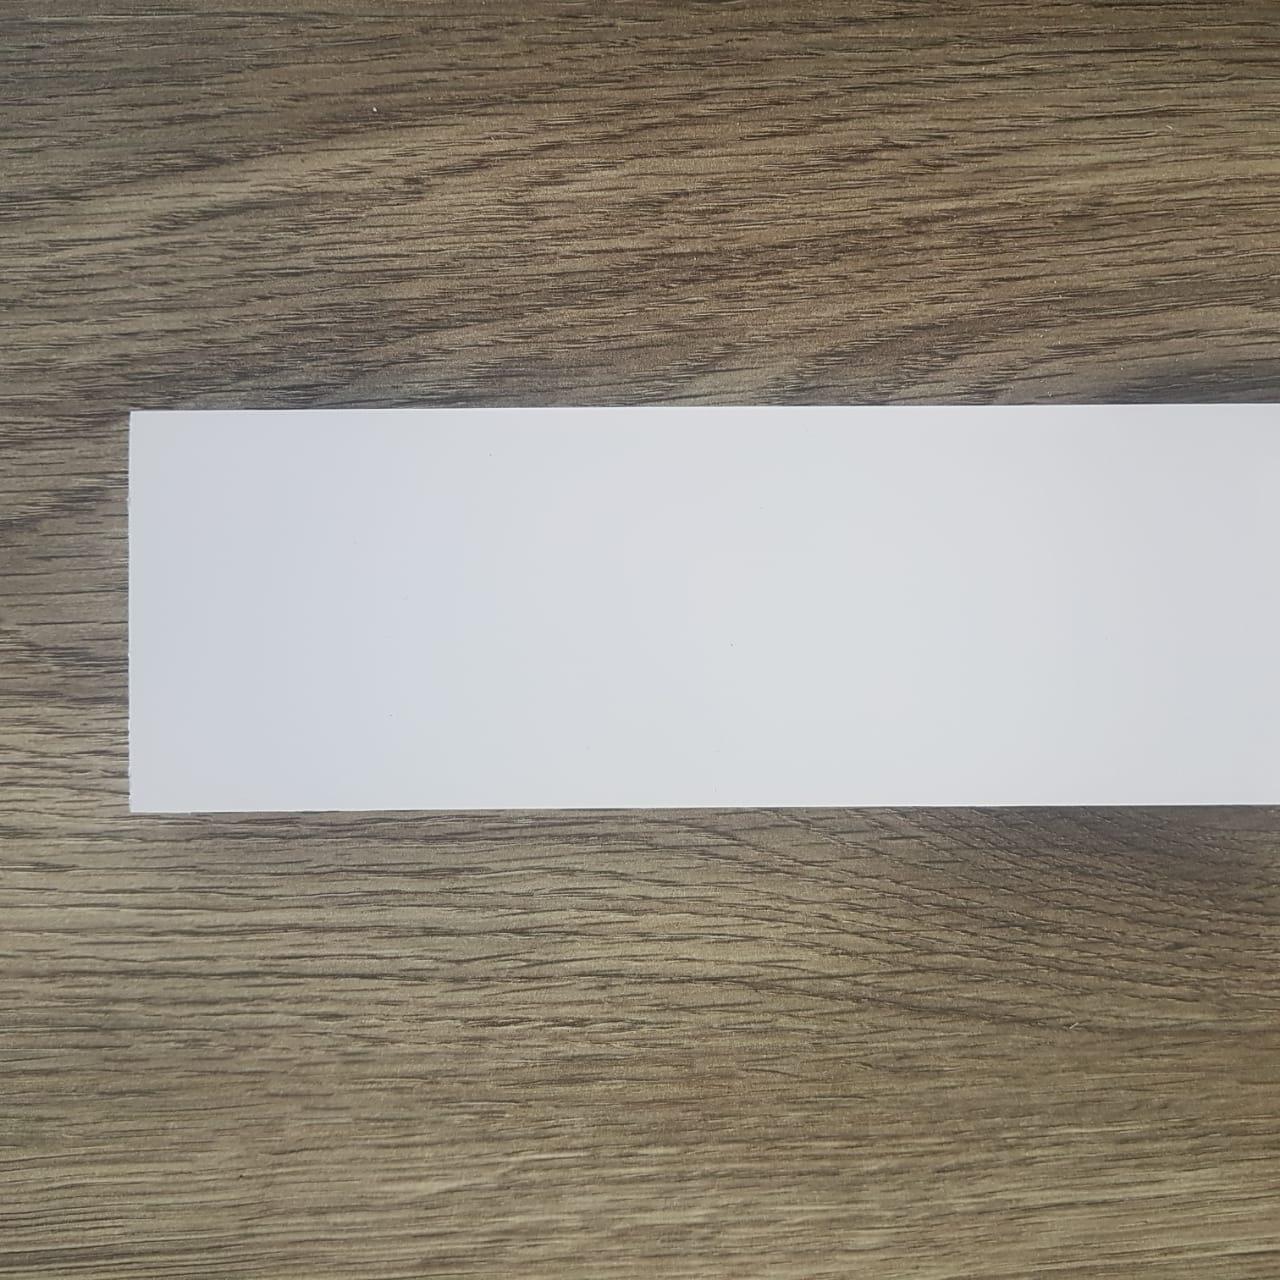 Rodapé de Poliestireno Liso - Branco - 7cm de altura  (7x1x240cm)